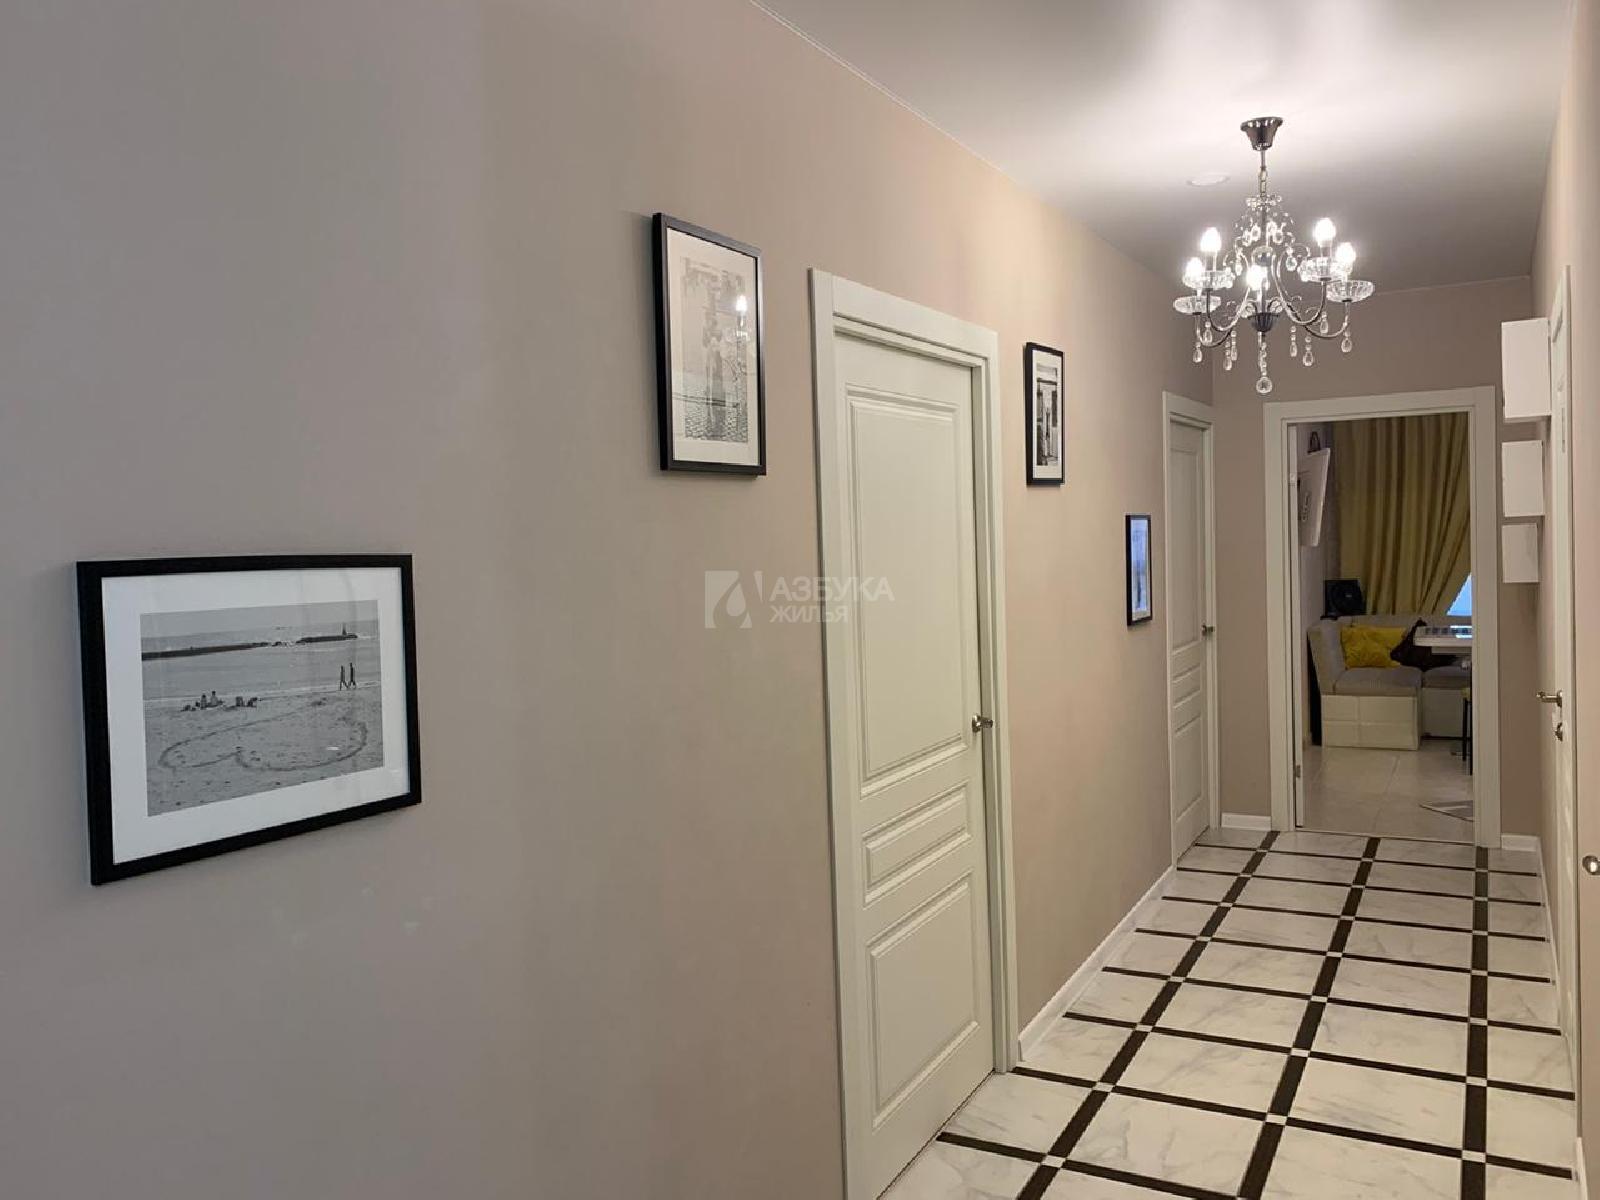 Фото №1 - 3-комнатная квартира, Москва, Поляны улица 5, метро Улица Скобелевская